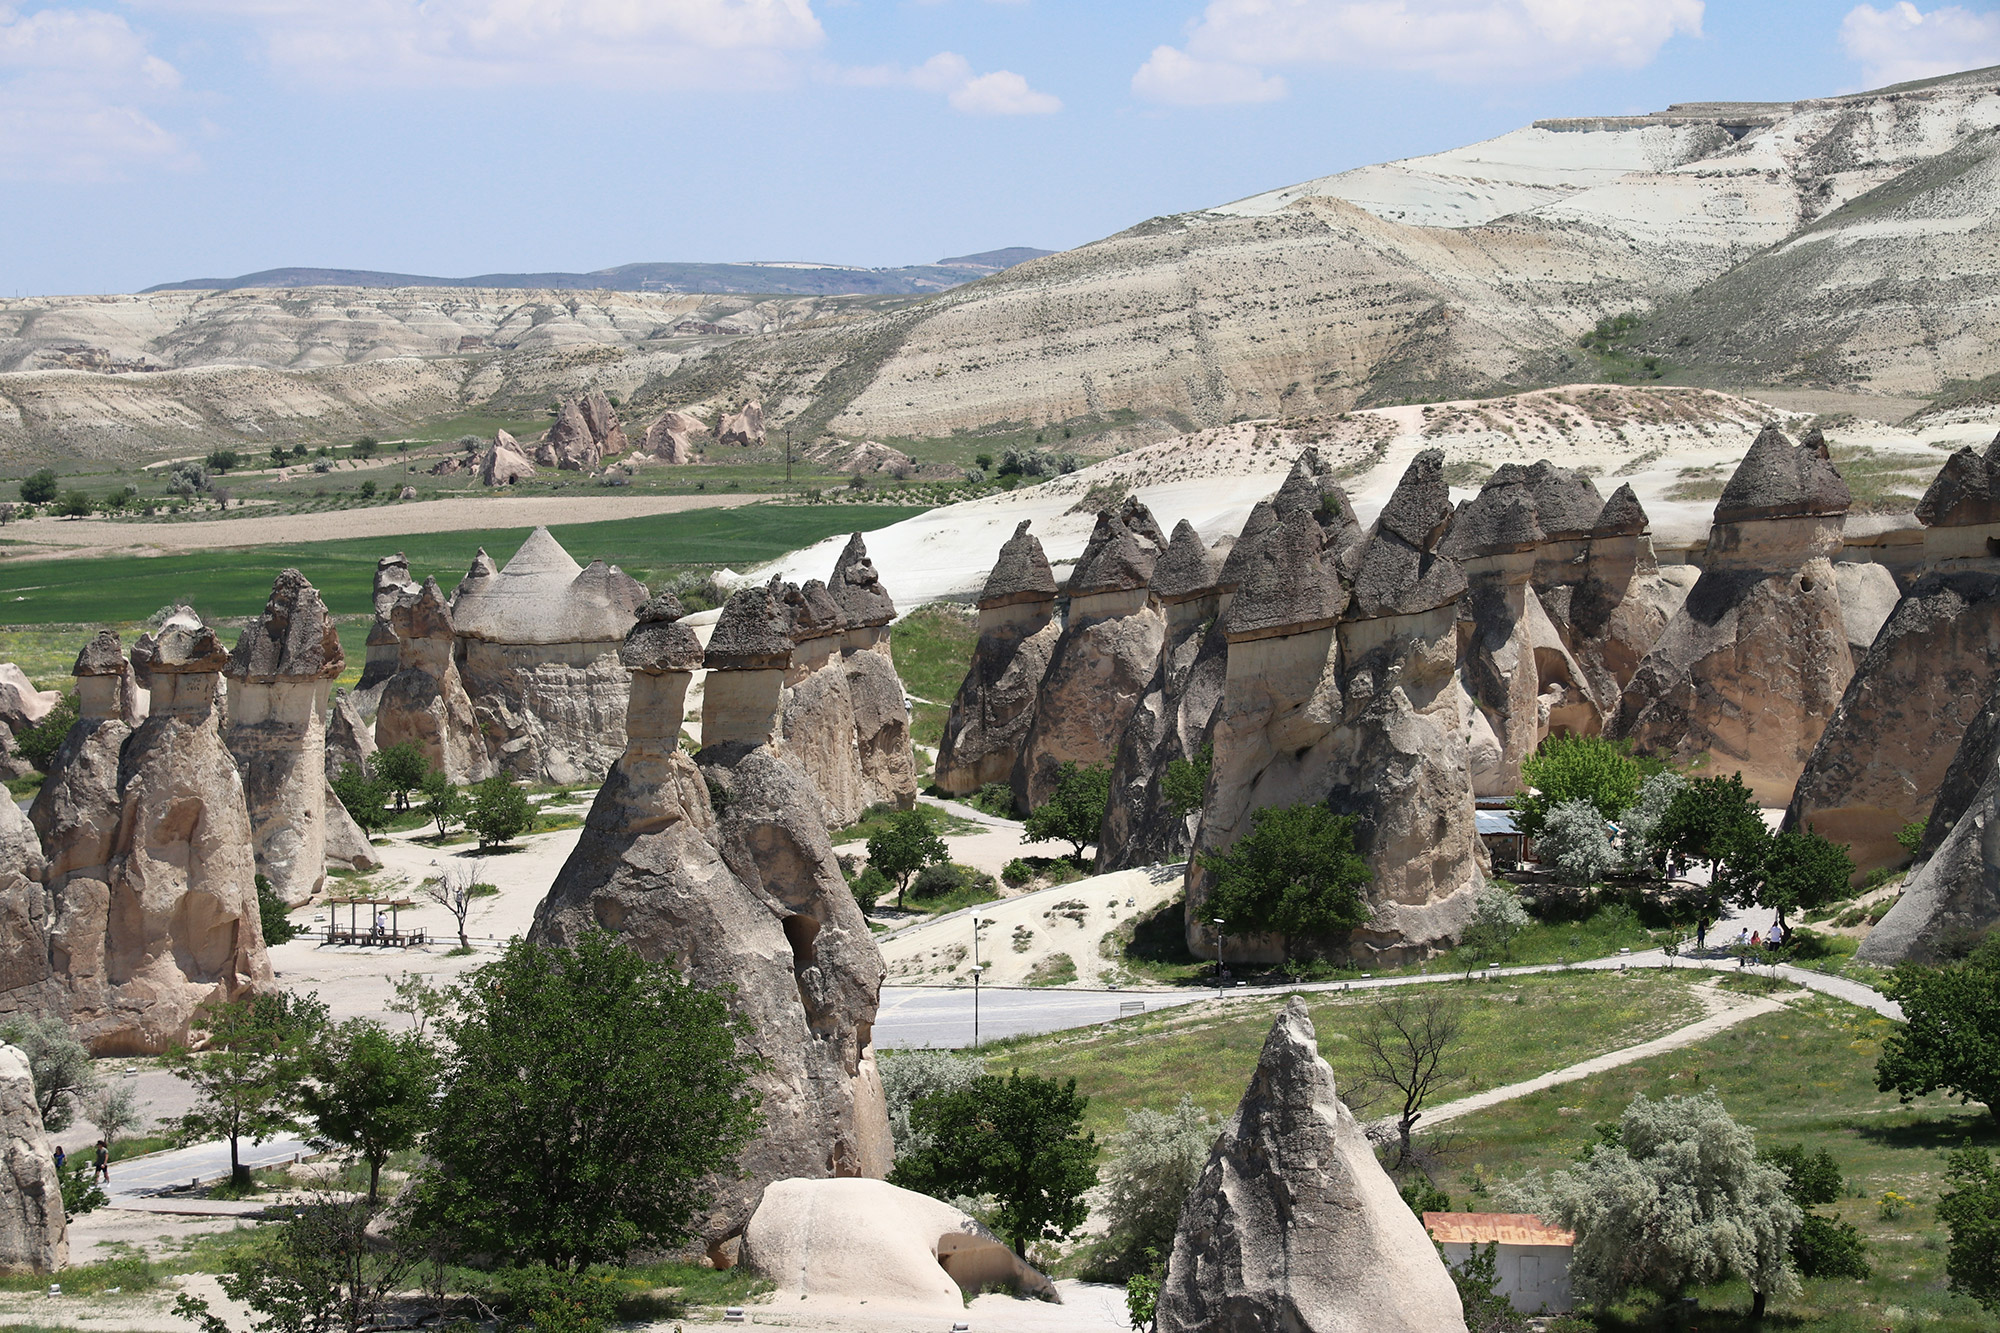 Turkije reisverslag: Terug in Cappadocië - Pasabaglari